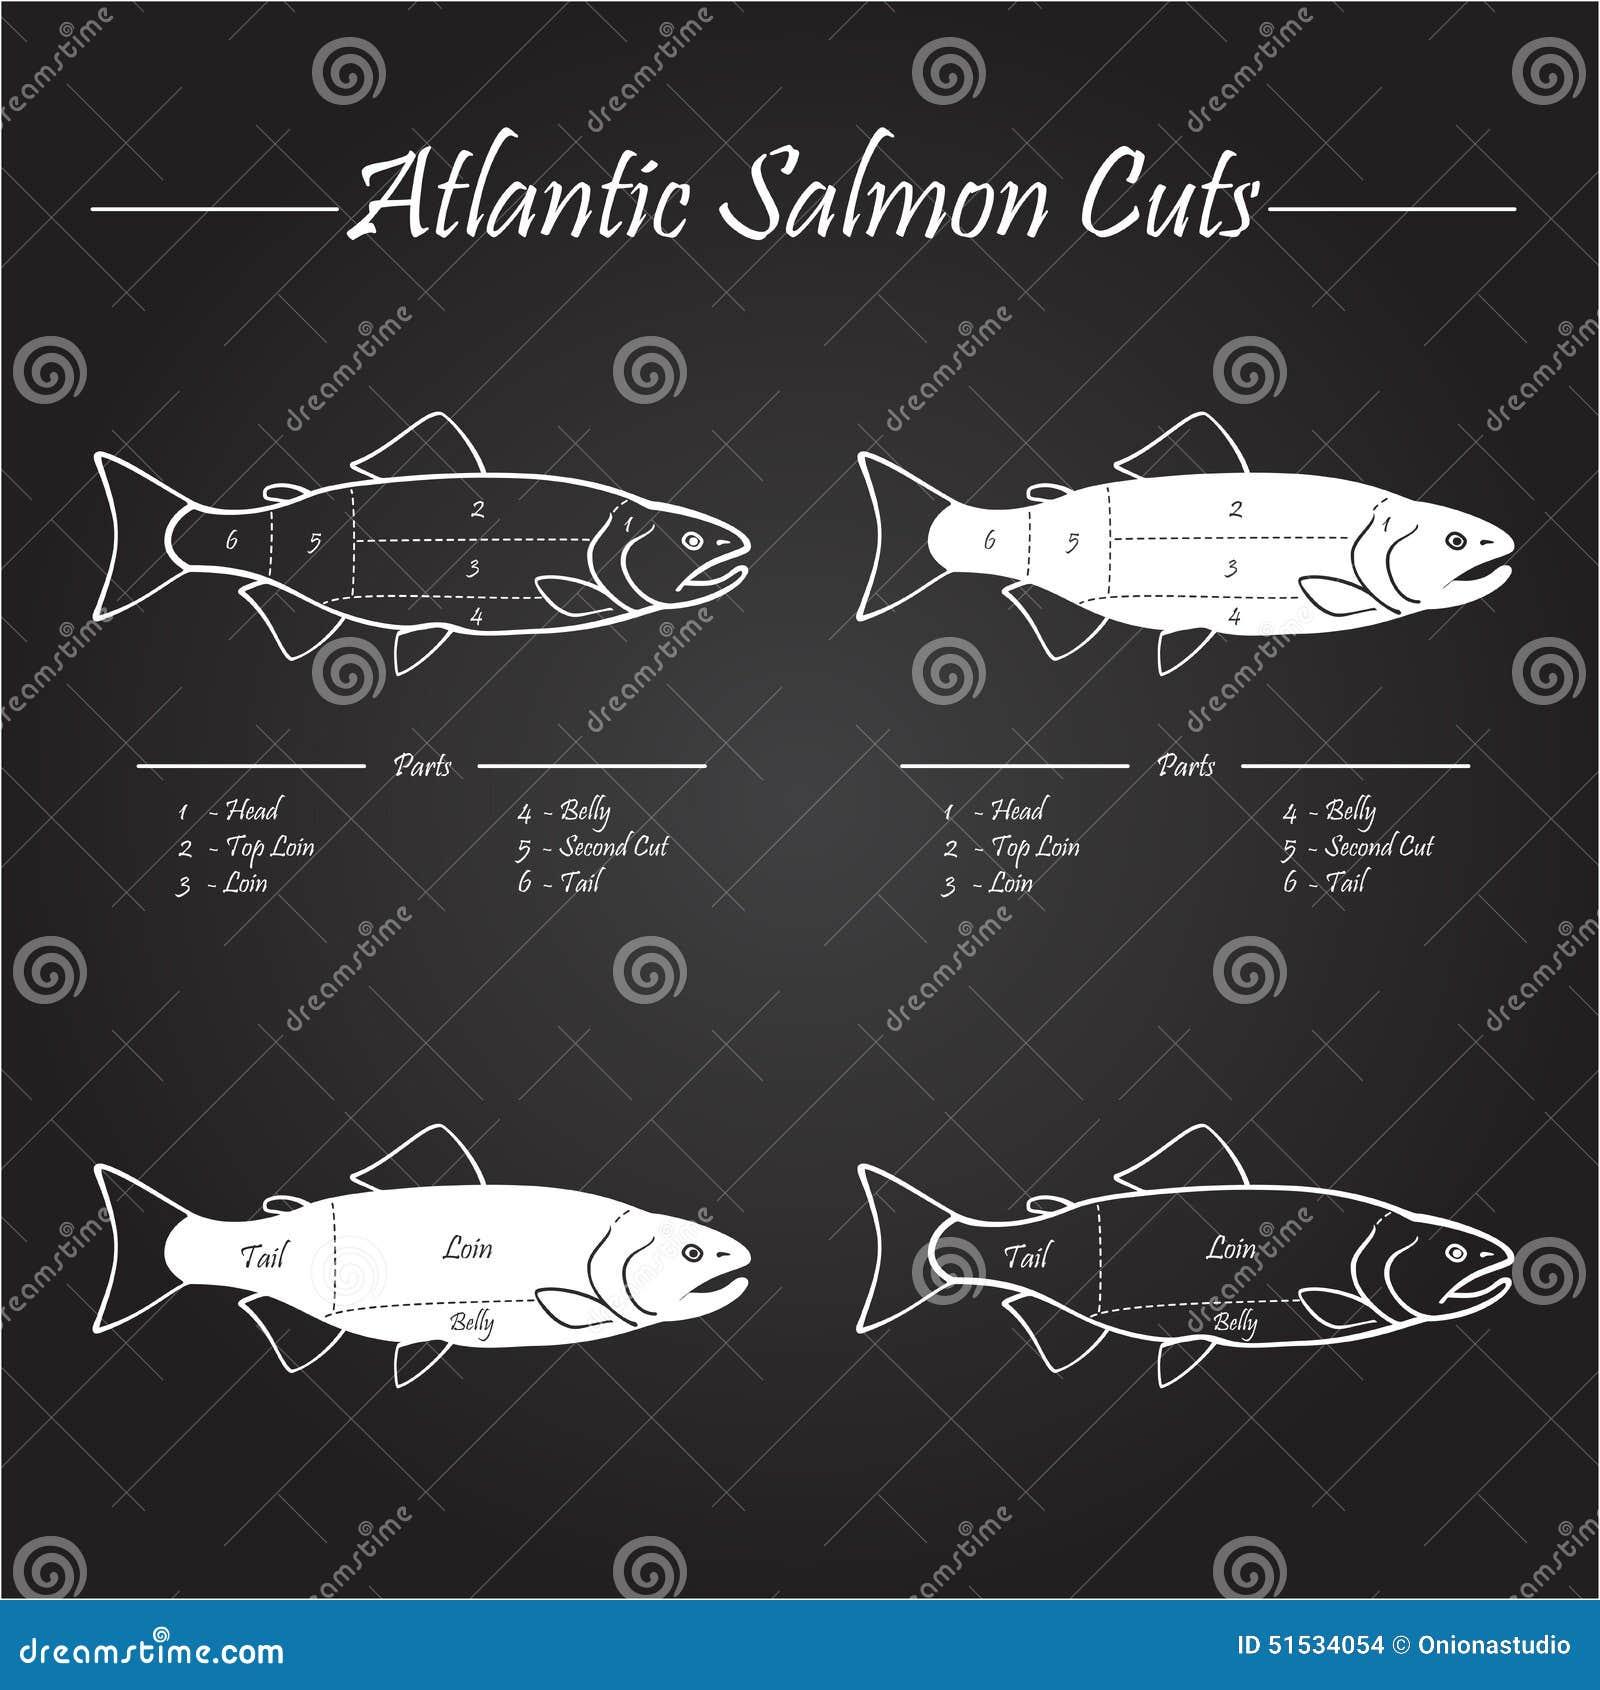 Atlantic Salmon Cuts Diagram Stock Vector